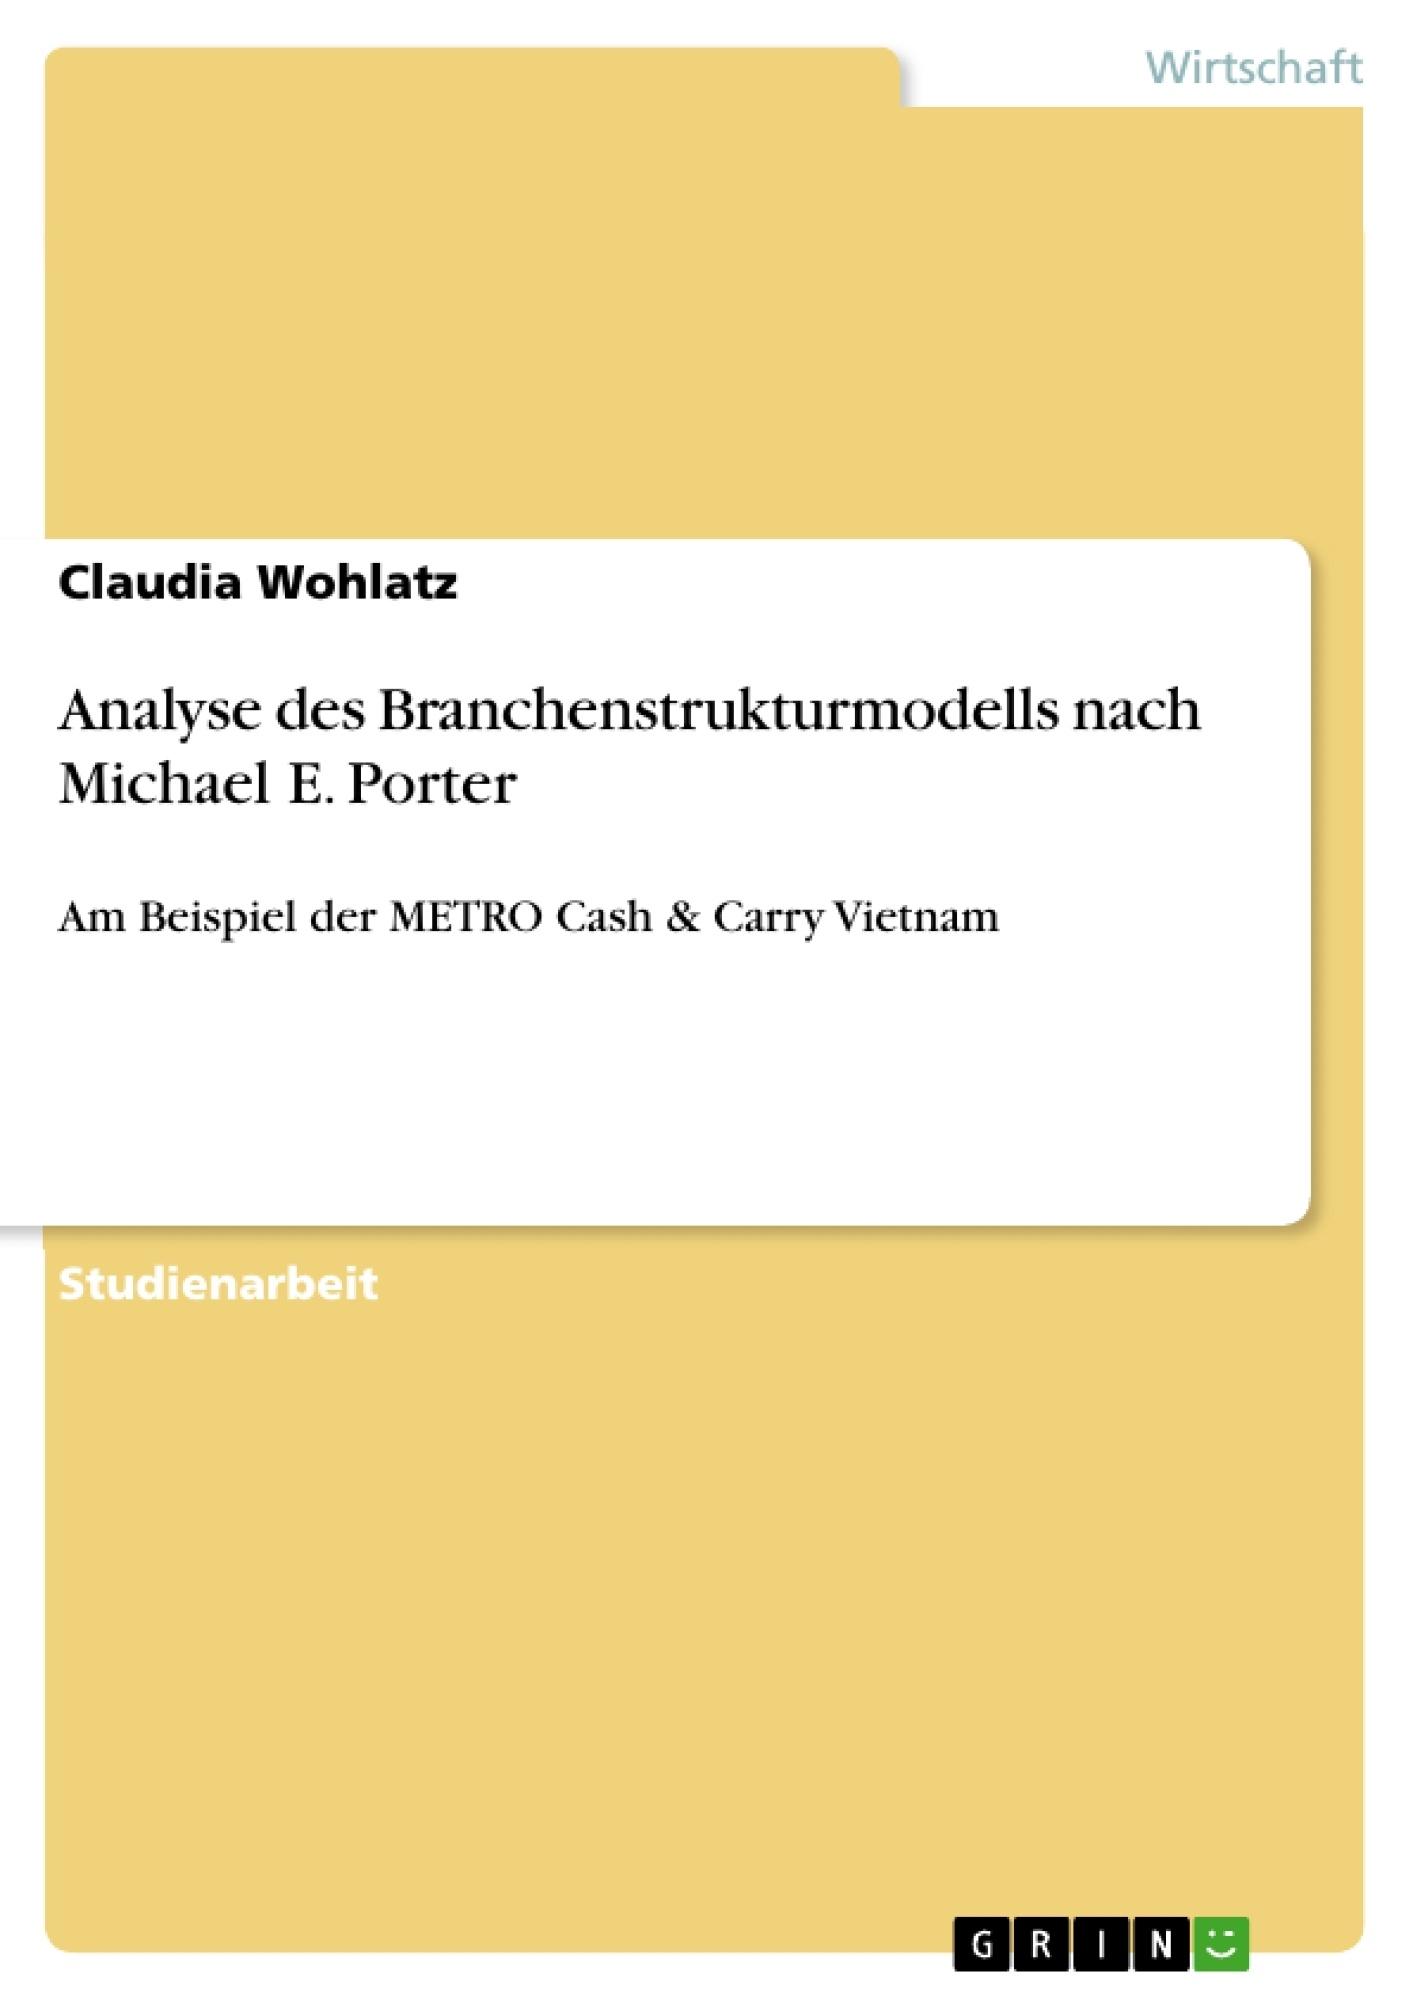 Titel: Analyse des Branchenstrukturmodells nach Michael E. Porter